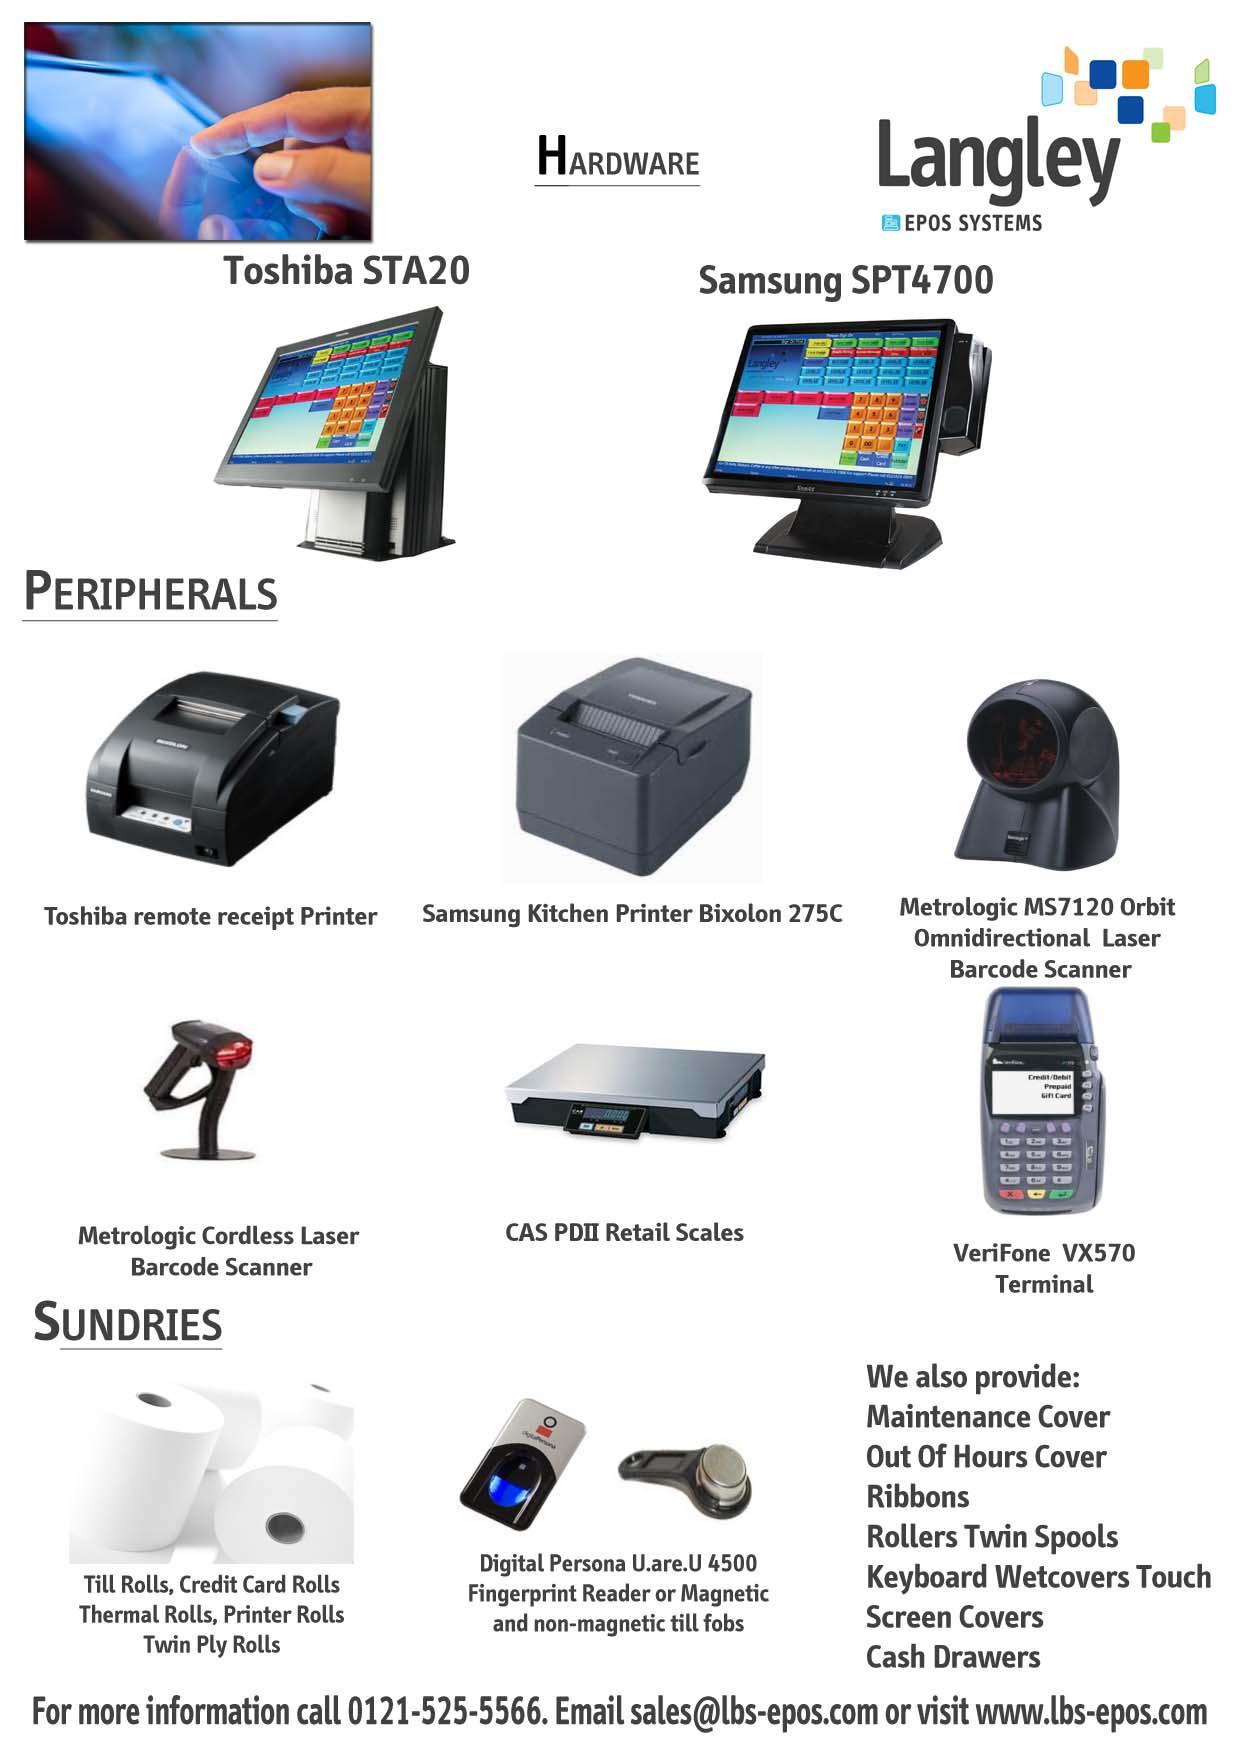 Hardware & Peripherals RGB